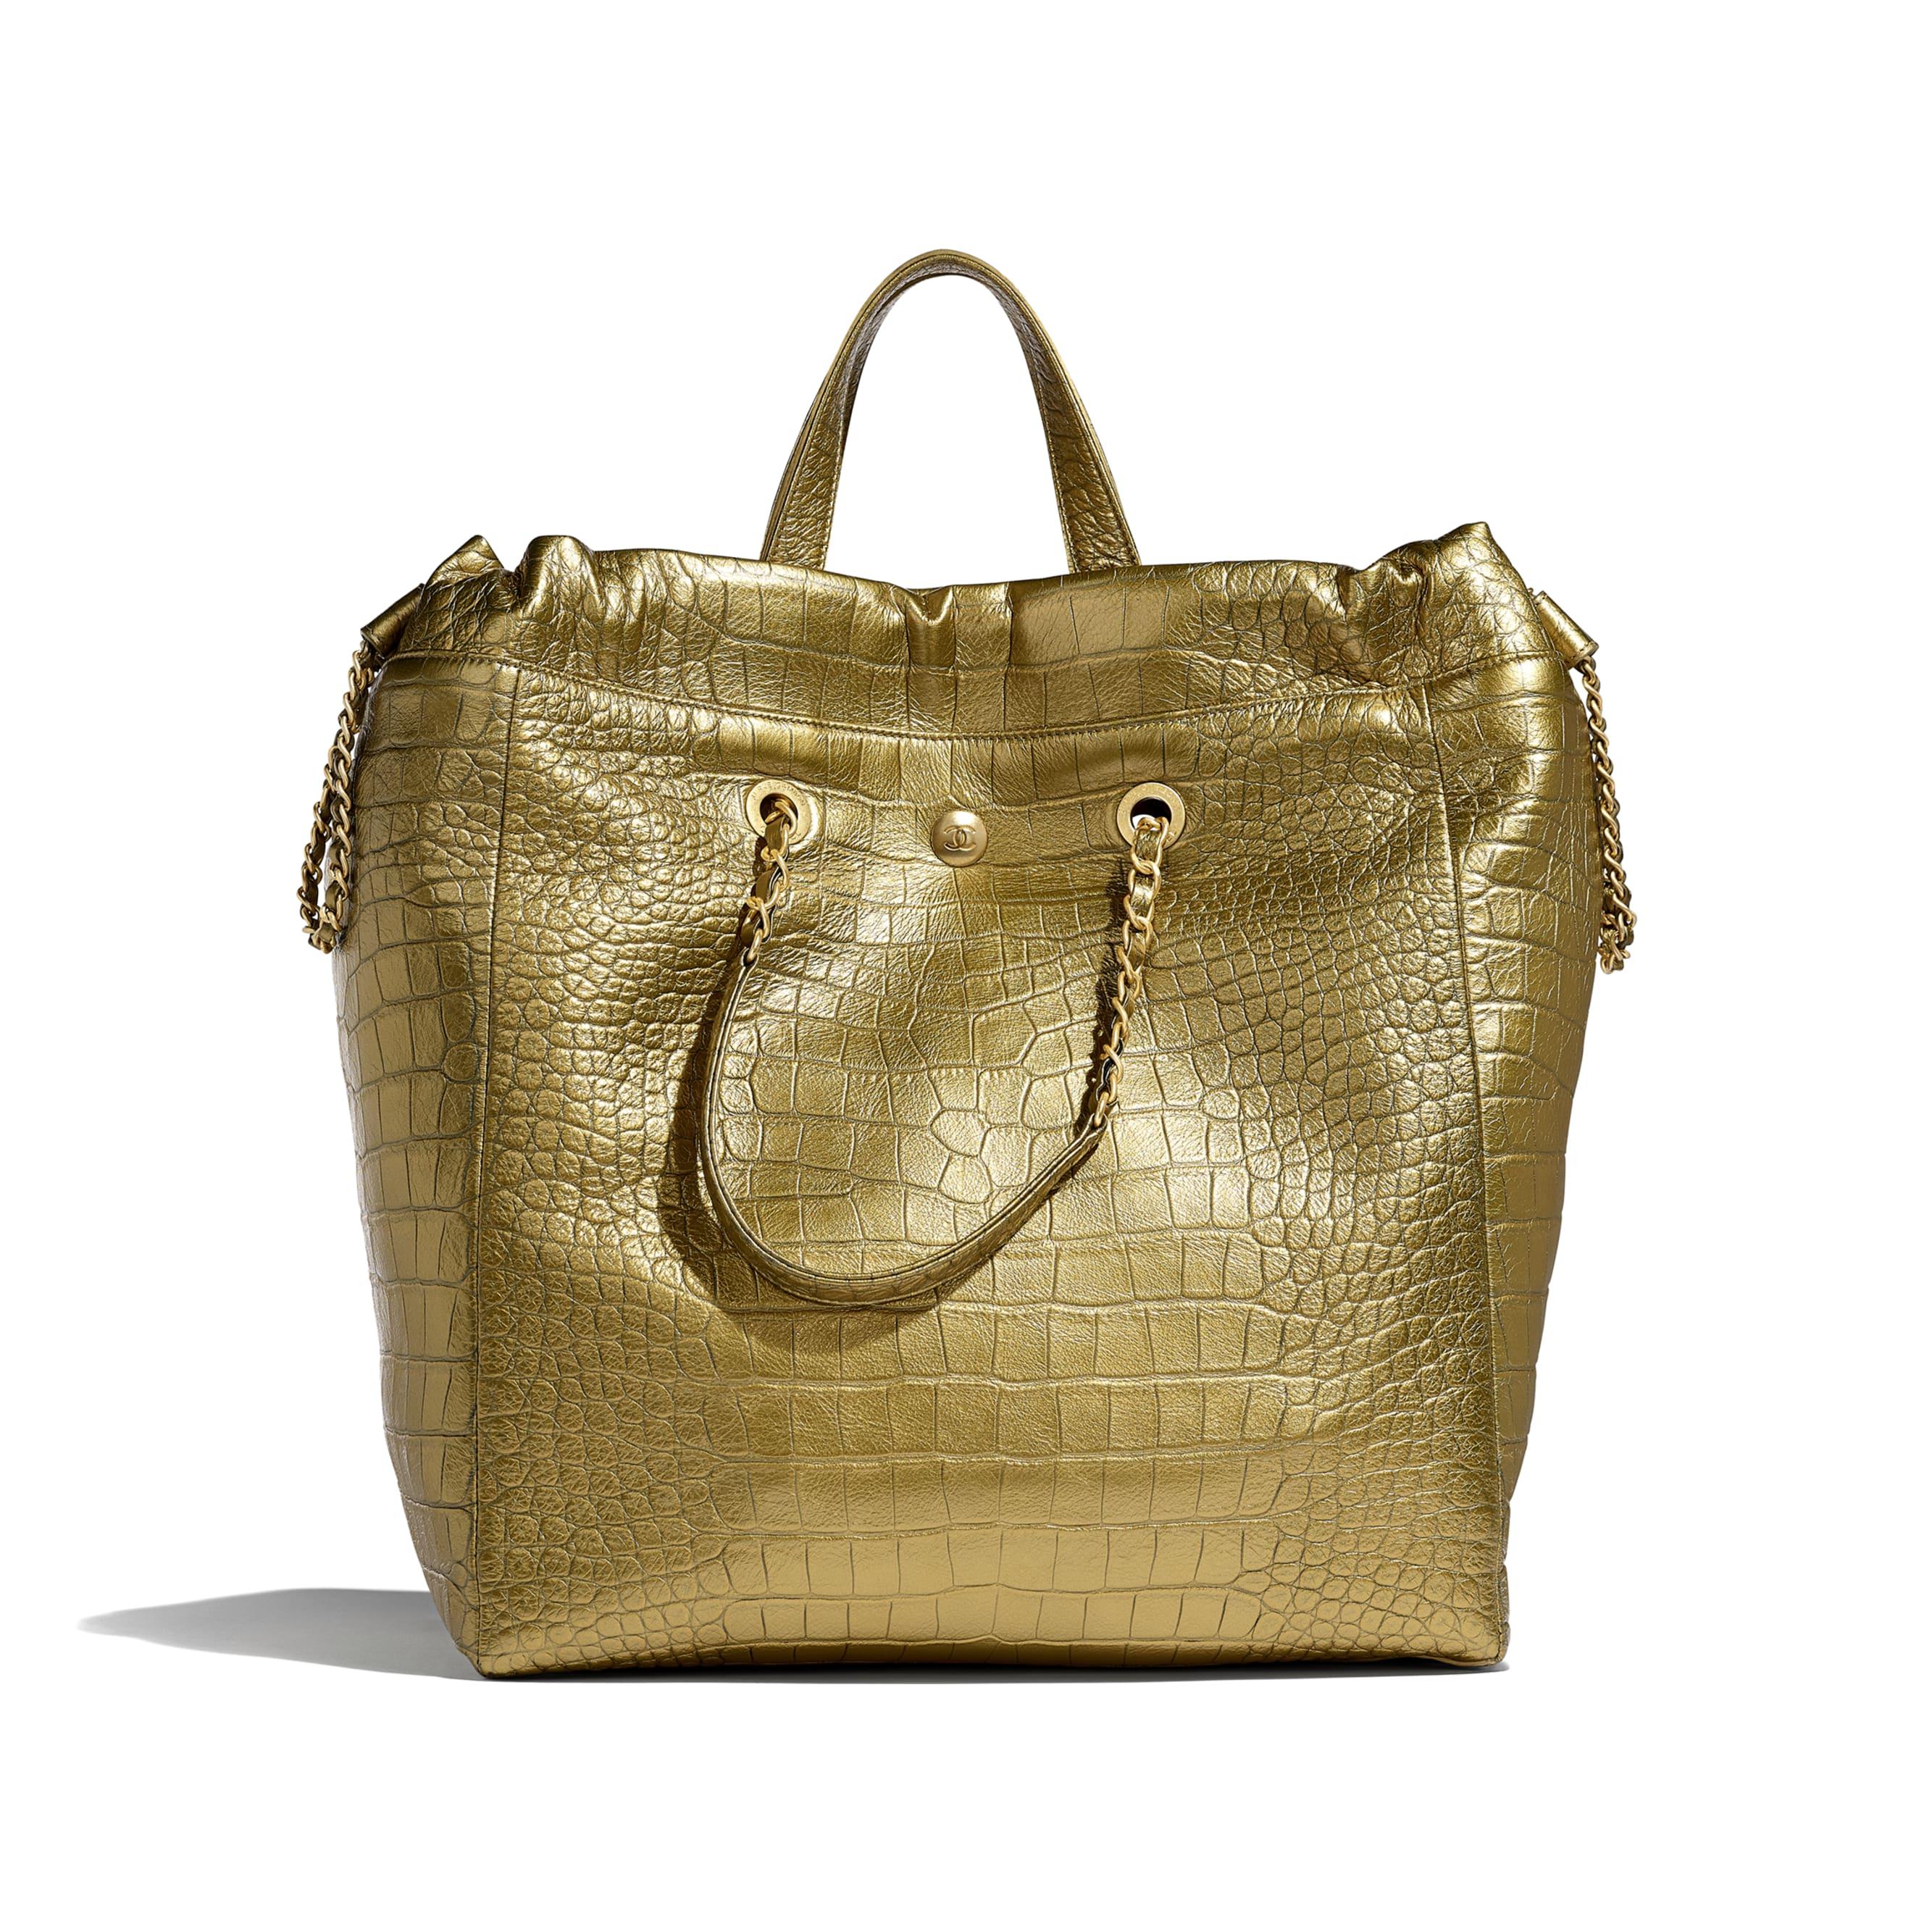 Large Shopping Bag - Gold - Metallic Crocodile Embossed Calfskin & Gold Metal - Alternative view - see standard sized version